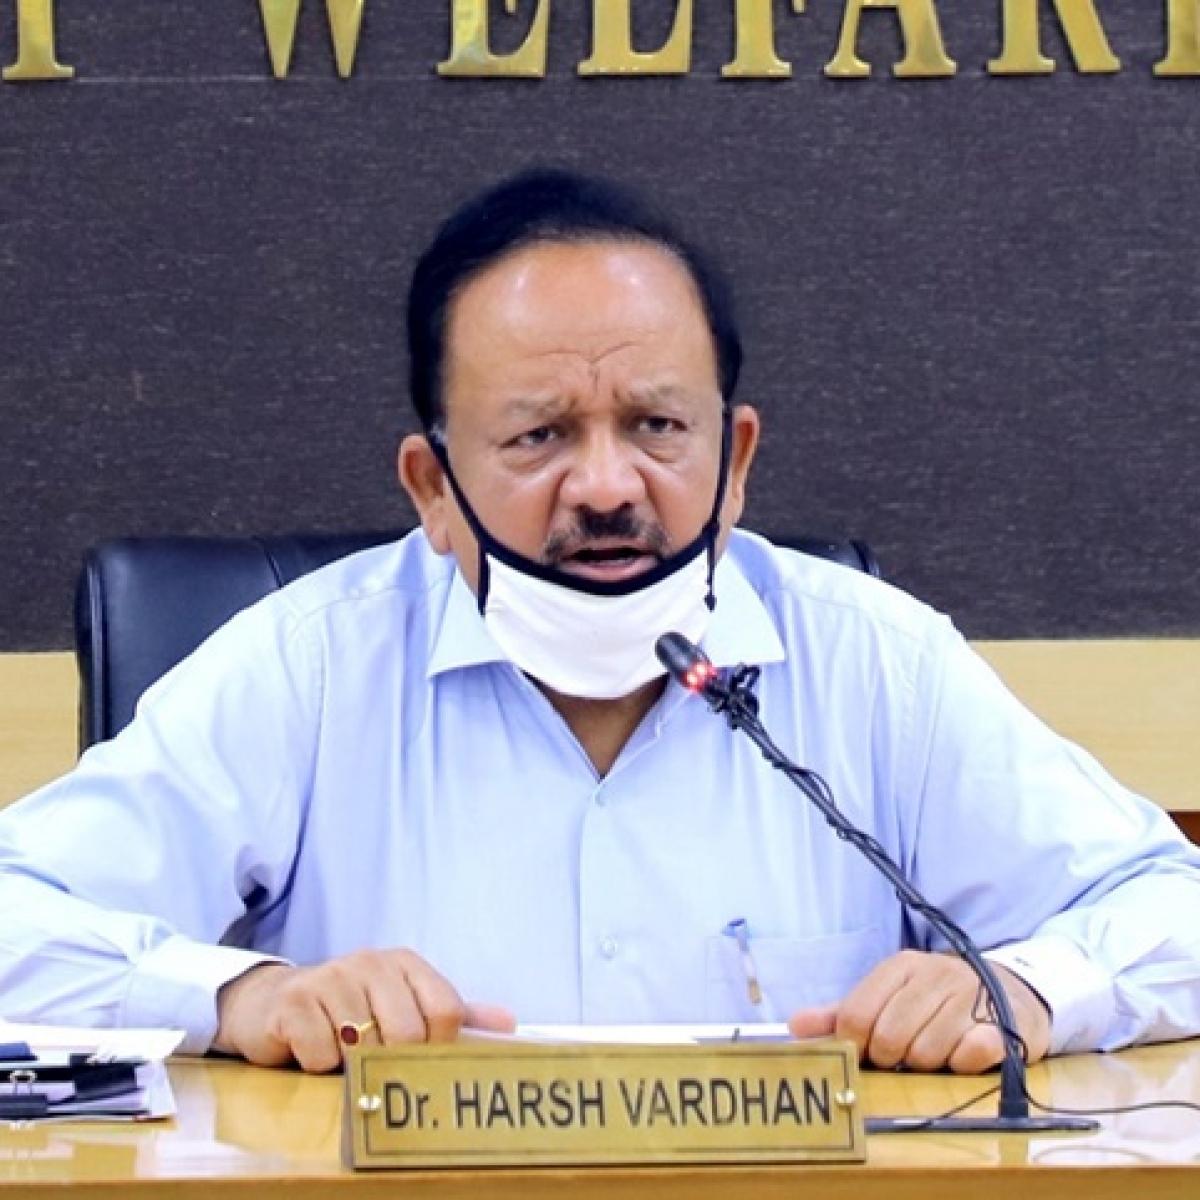 Chhattisgarh asks Centre to halt the supply of Covaxin, Union Health Minister Harsh Vardhan responds